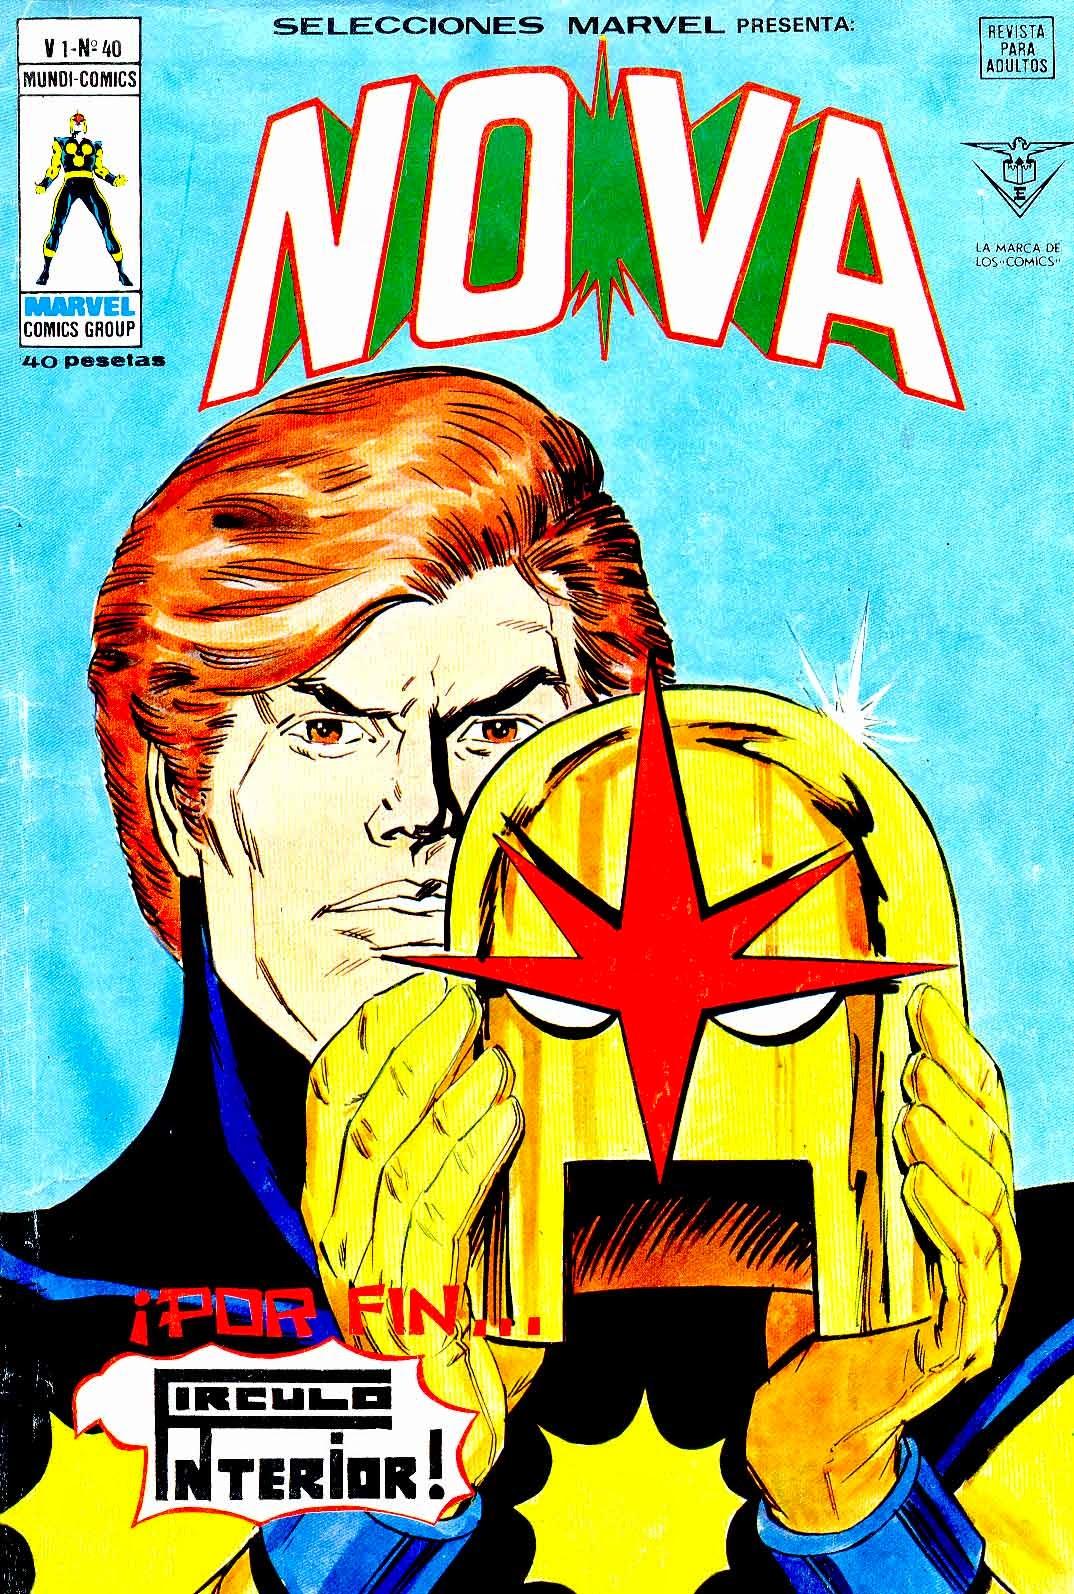 Portada de Nova-Selecciones Marvel Volumen 1 Nº 40 Ediciones Vértice